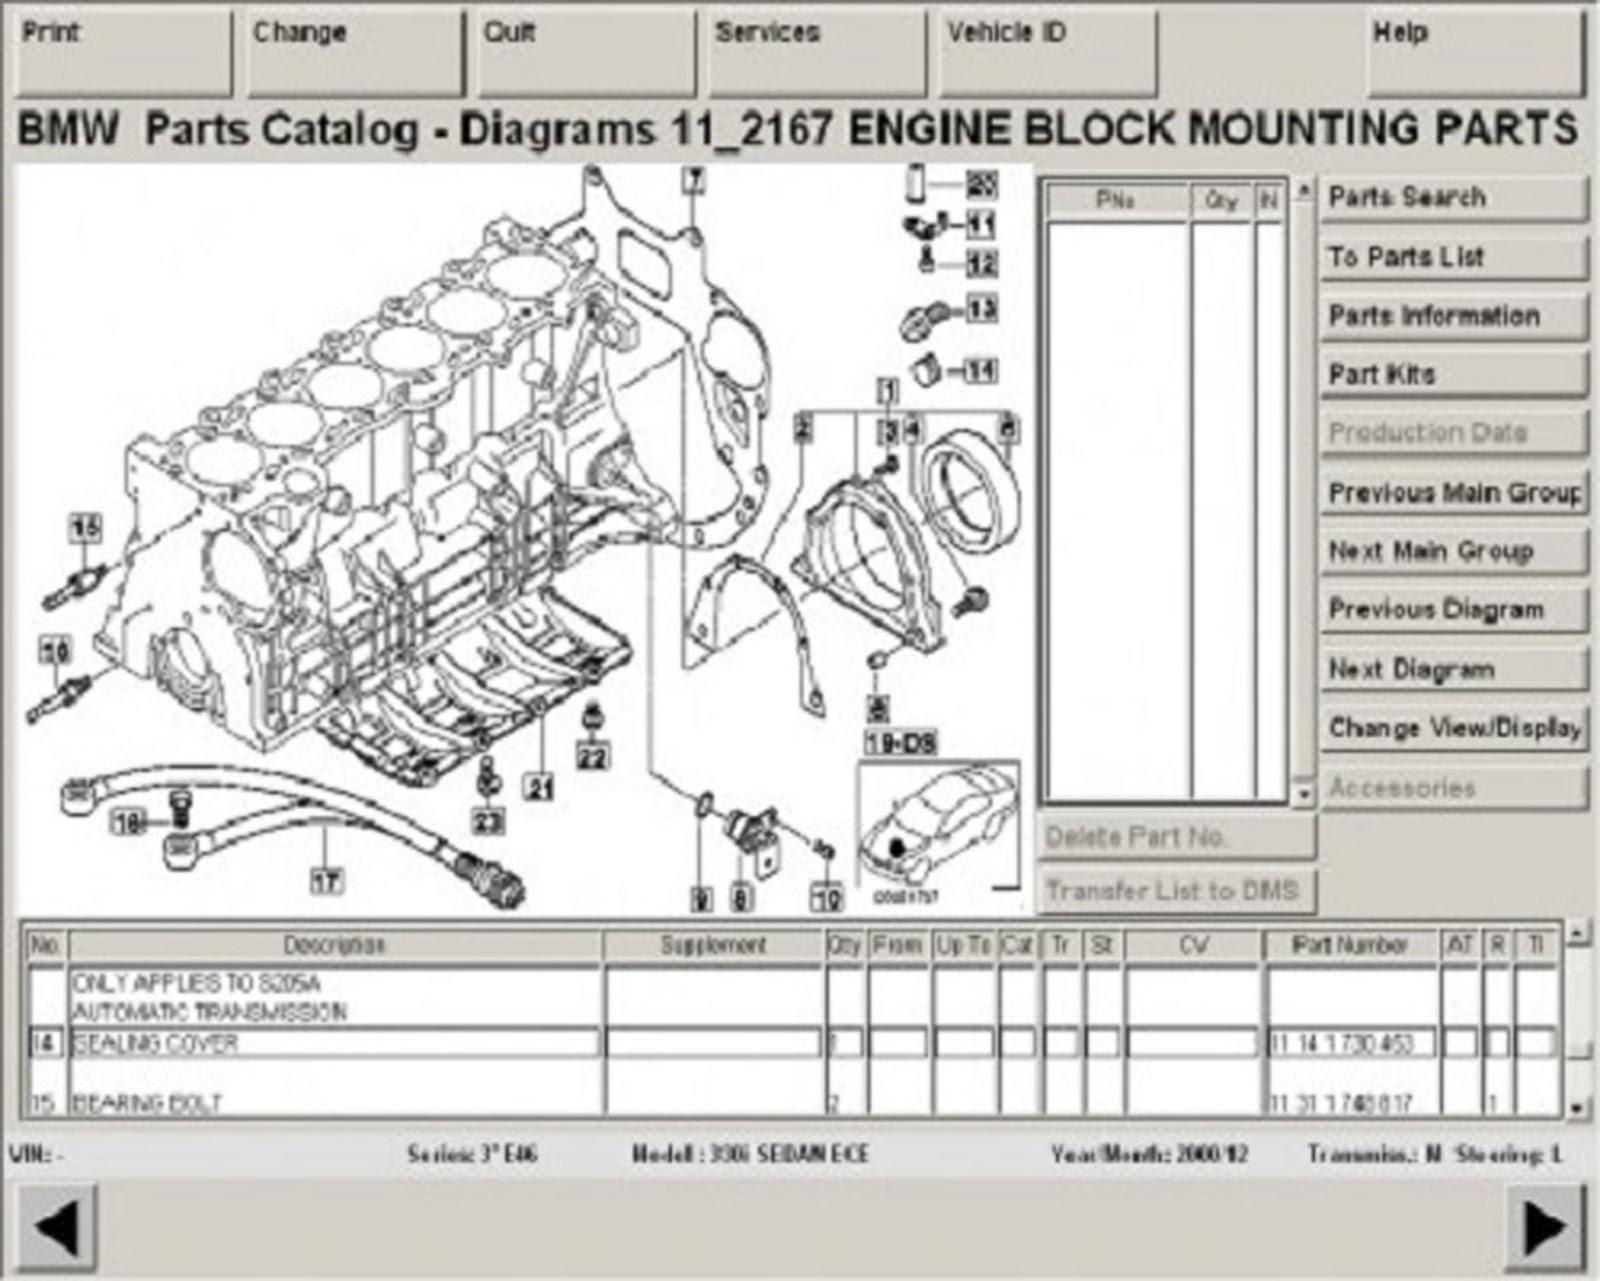 Bmw Workshop Service Repair Manuals Tis Wds Epc Etk Etm Obd2 Jombang E86 Wiring Diagram